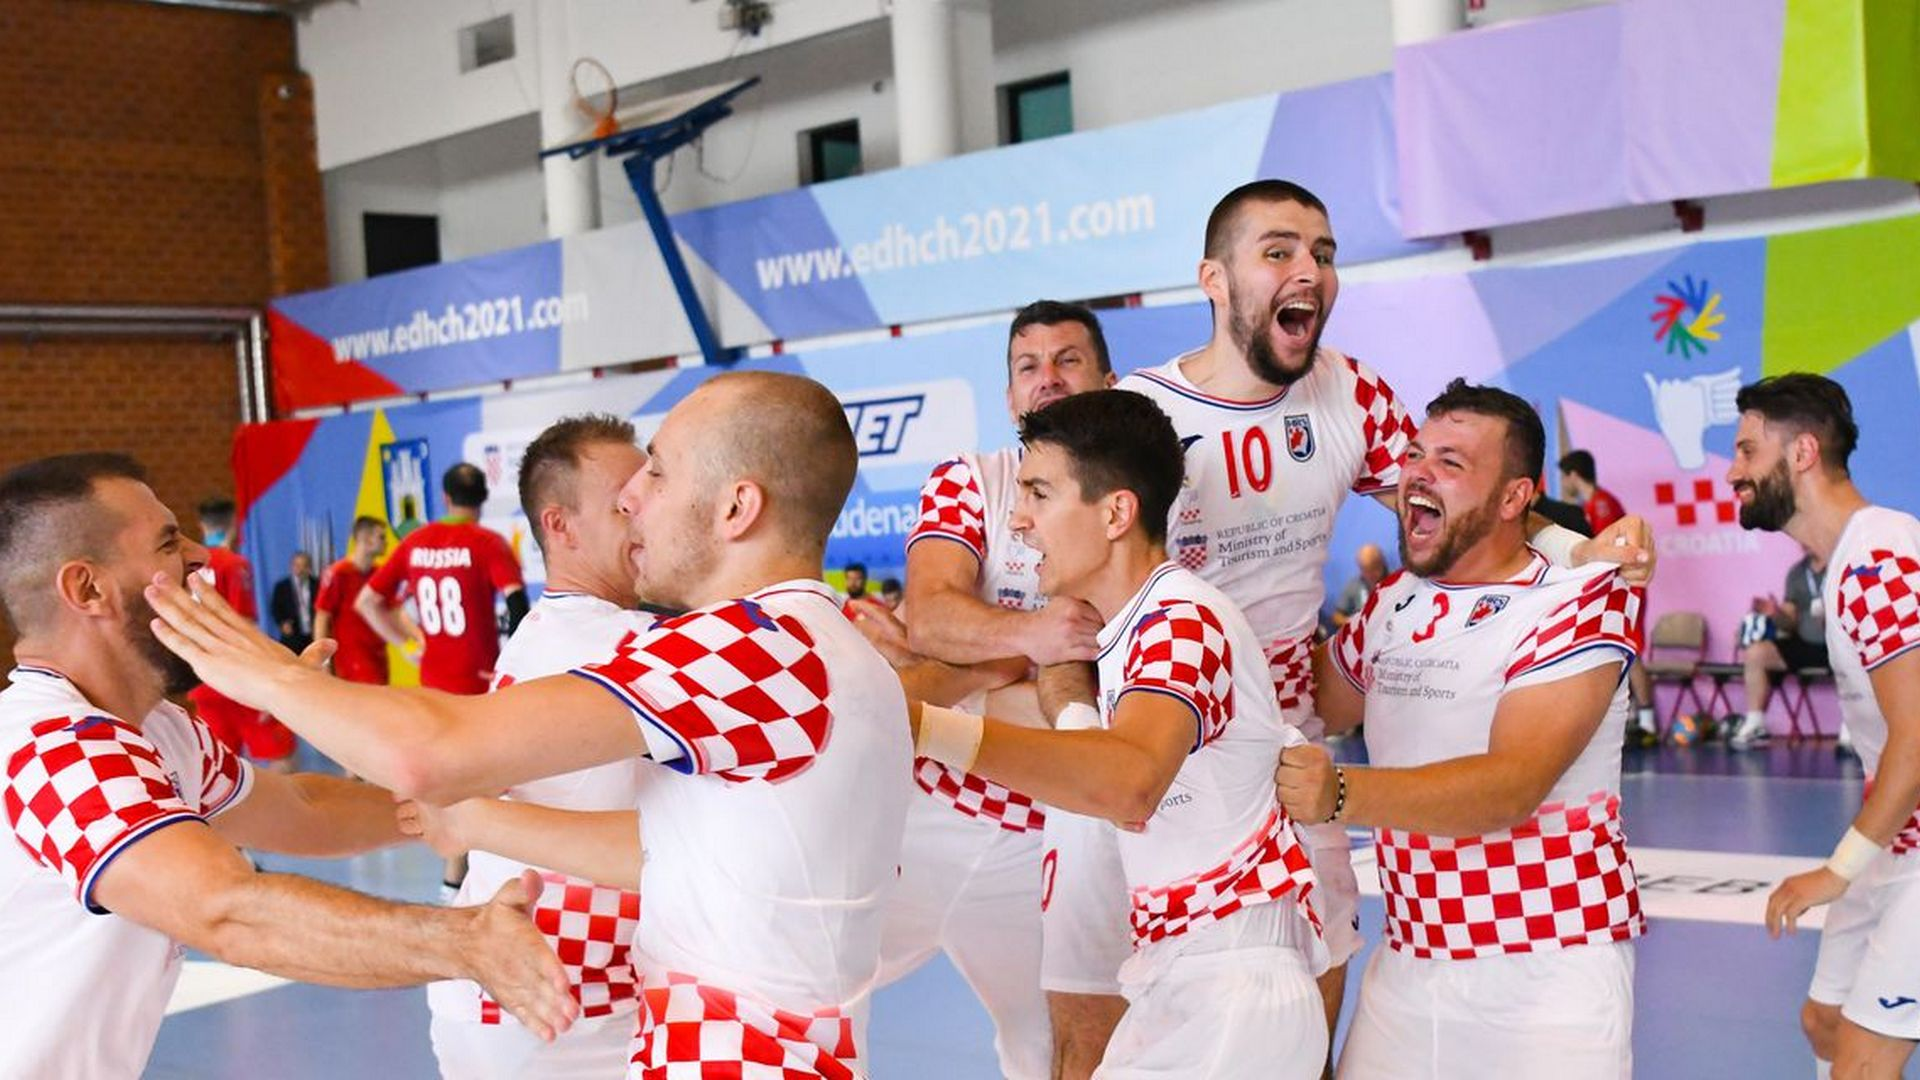 Hrvatska reprezentacija osvojila je naslov europskih prvaka! | Europsko prvenstvo u rukometu za gluhe